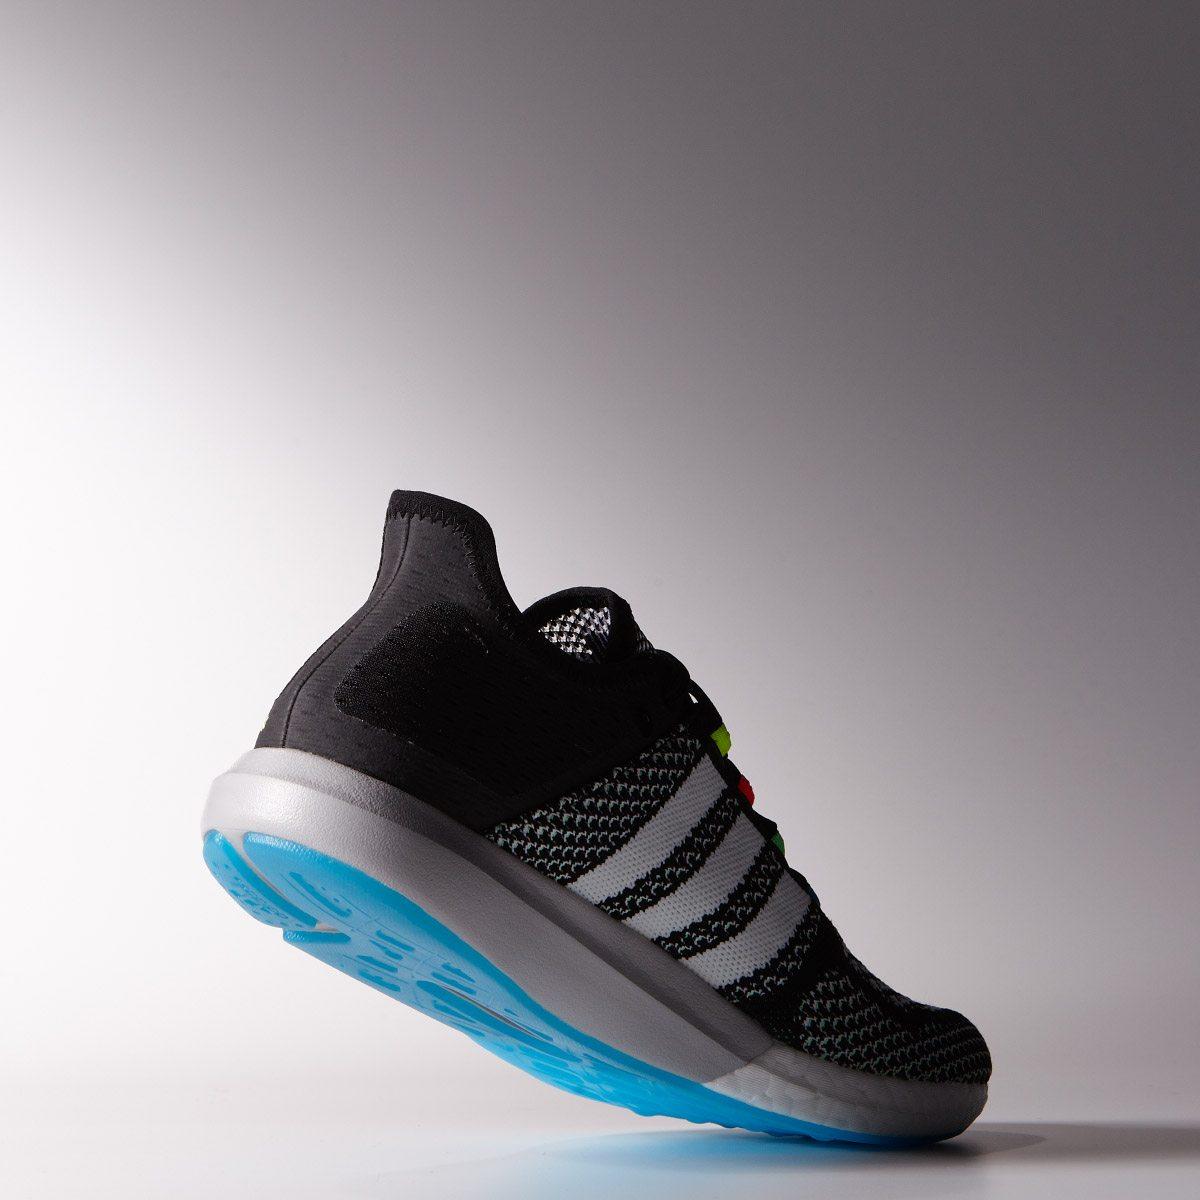 adidas Climachill Cosmic Gazelle Boost 5